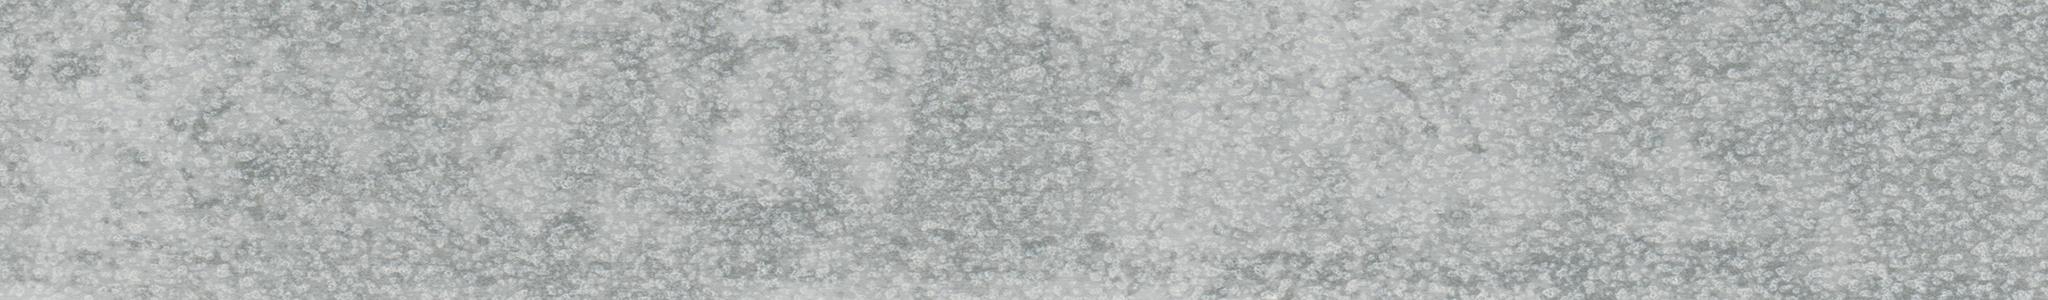 HD 293274 ABS hrana beton světlý hladký